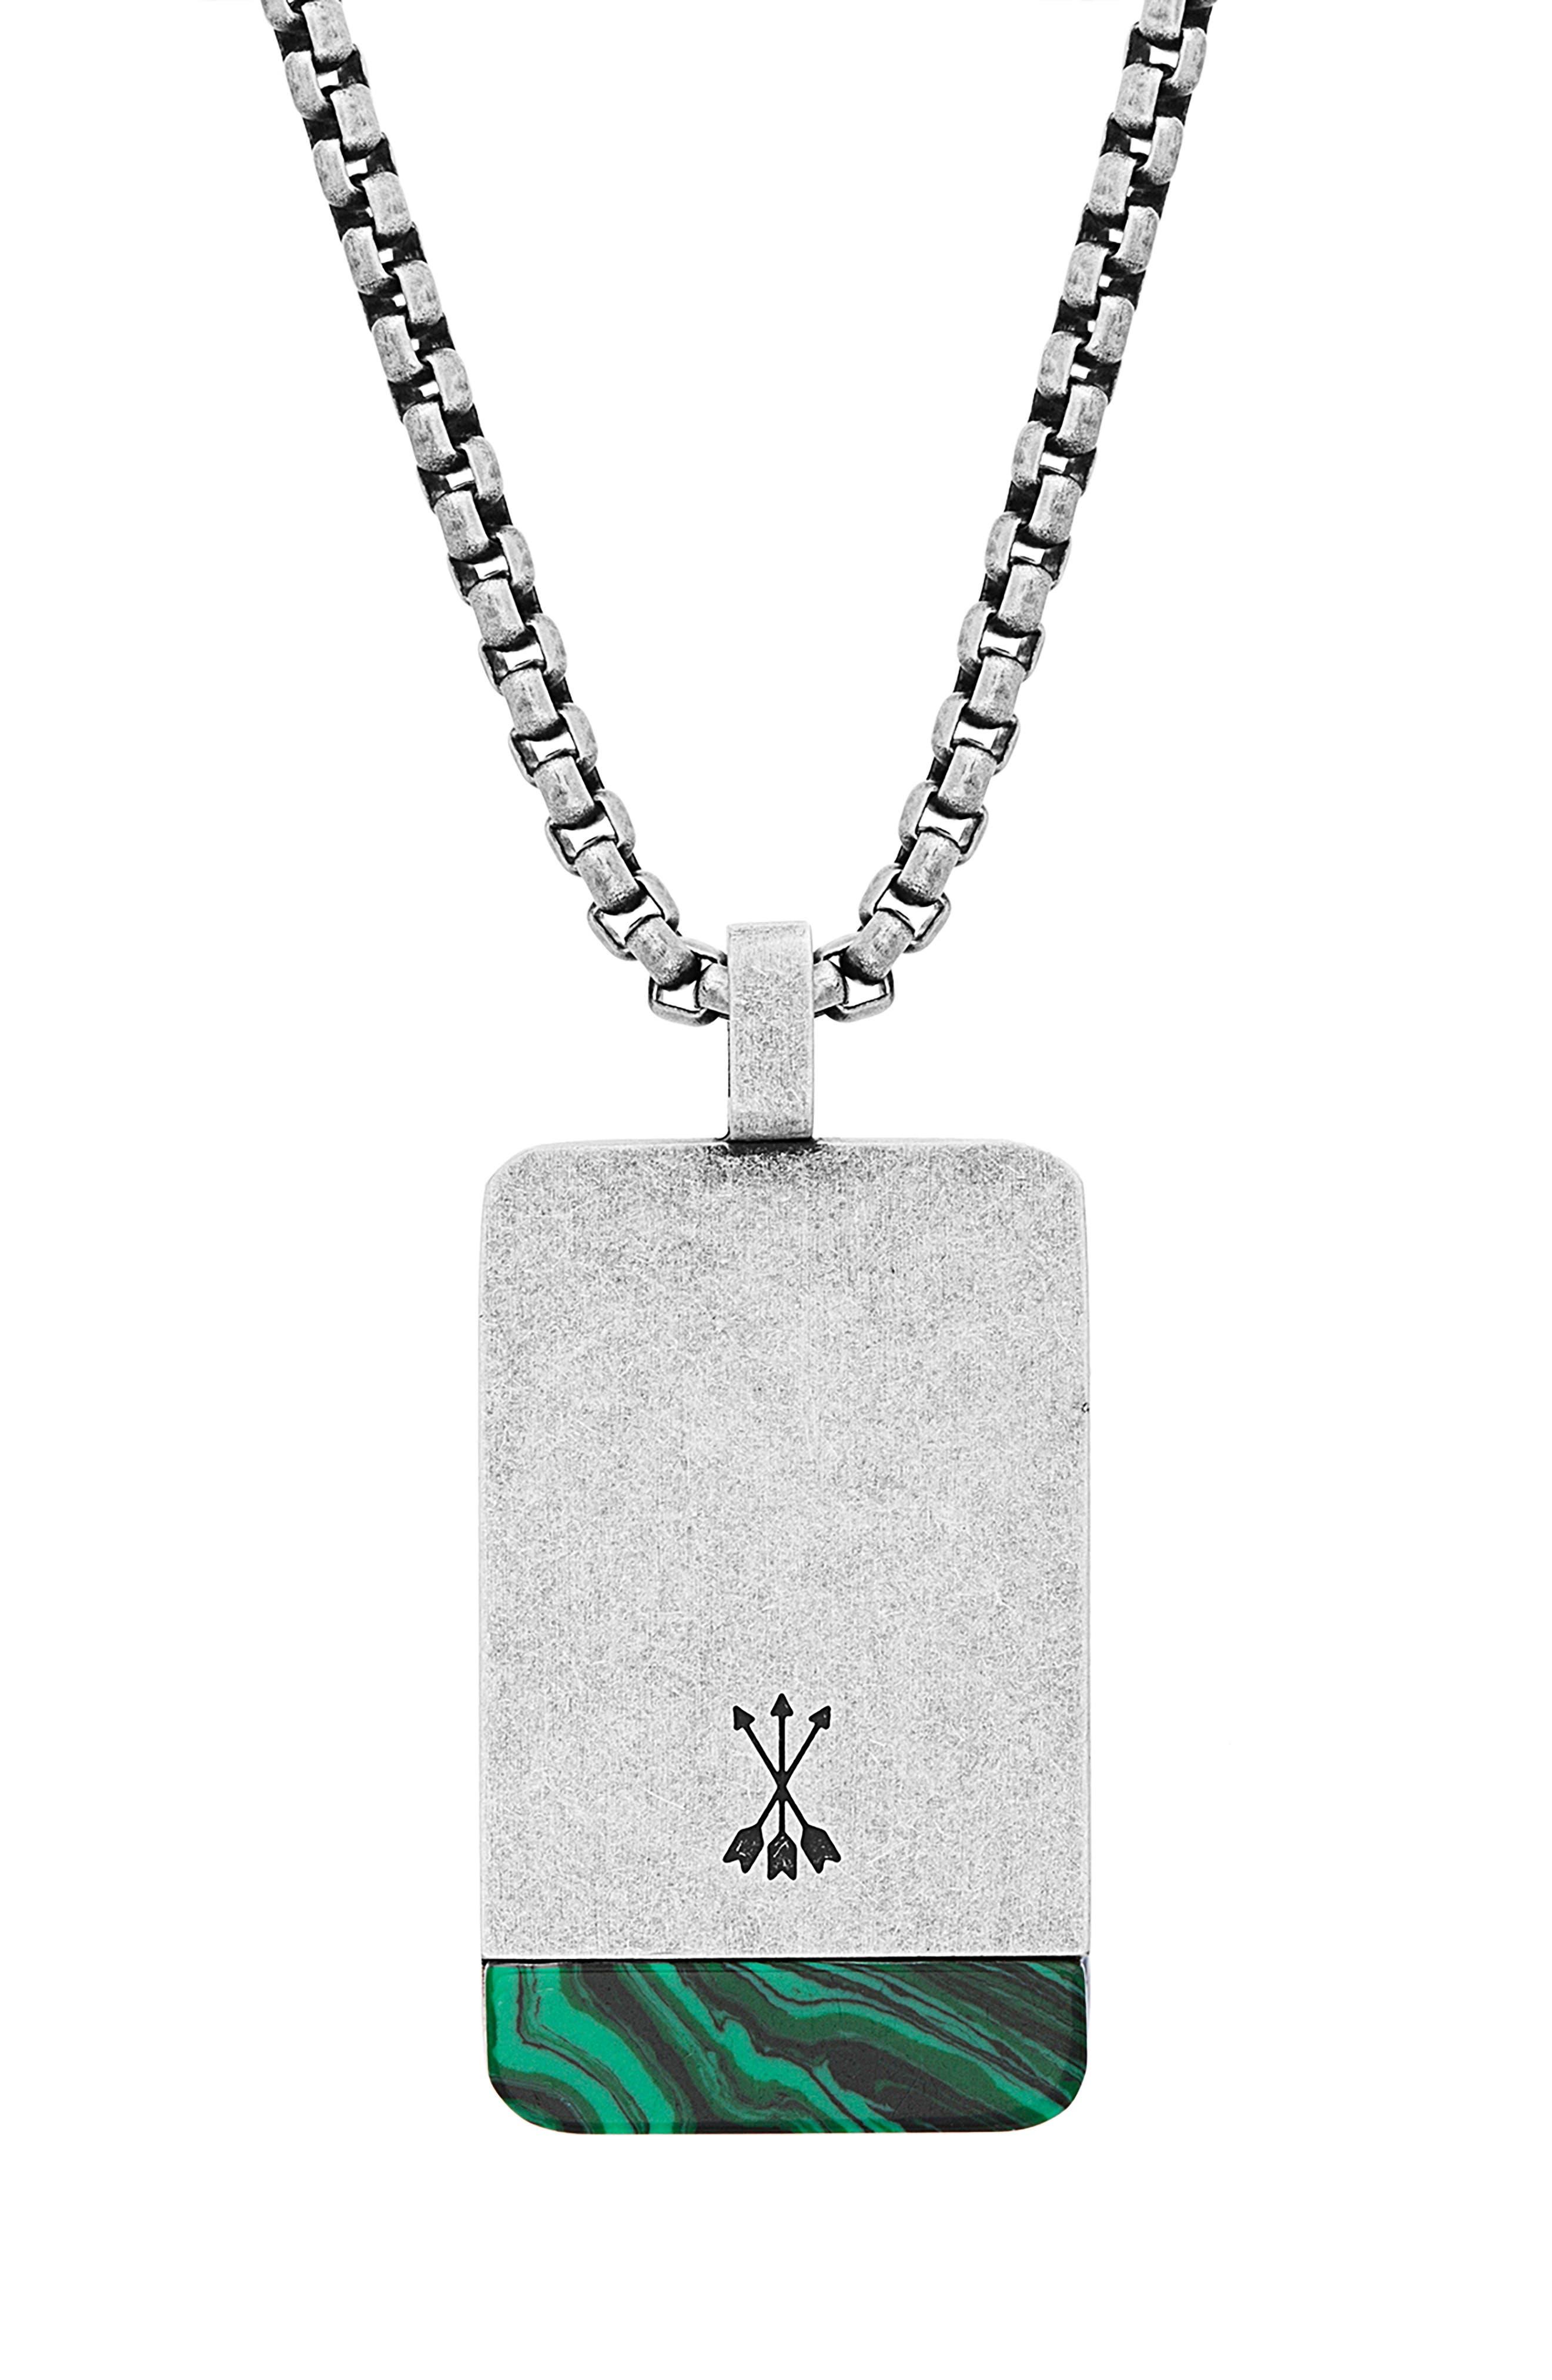 Dogtag Pendant Necklace,                             Alternate thumbnail 2, color,                             GREEN/ SILVER